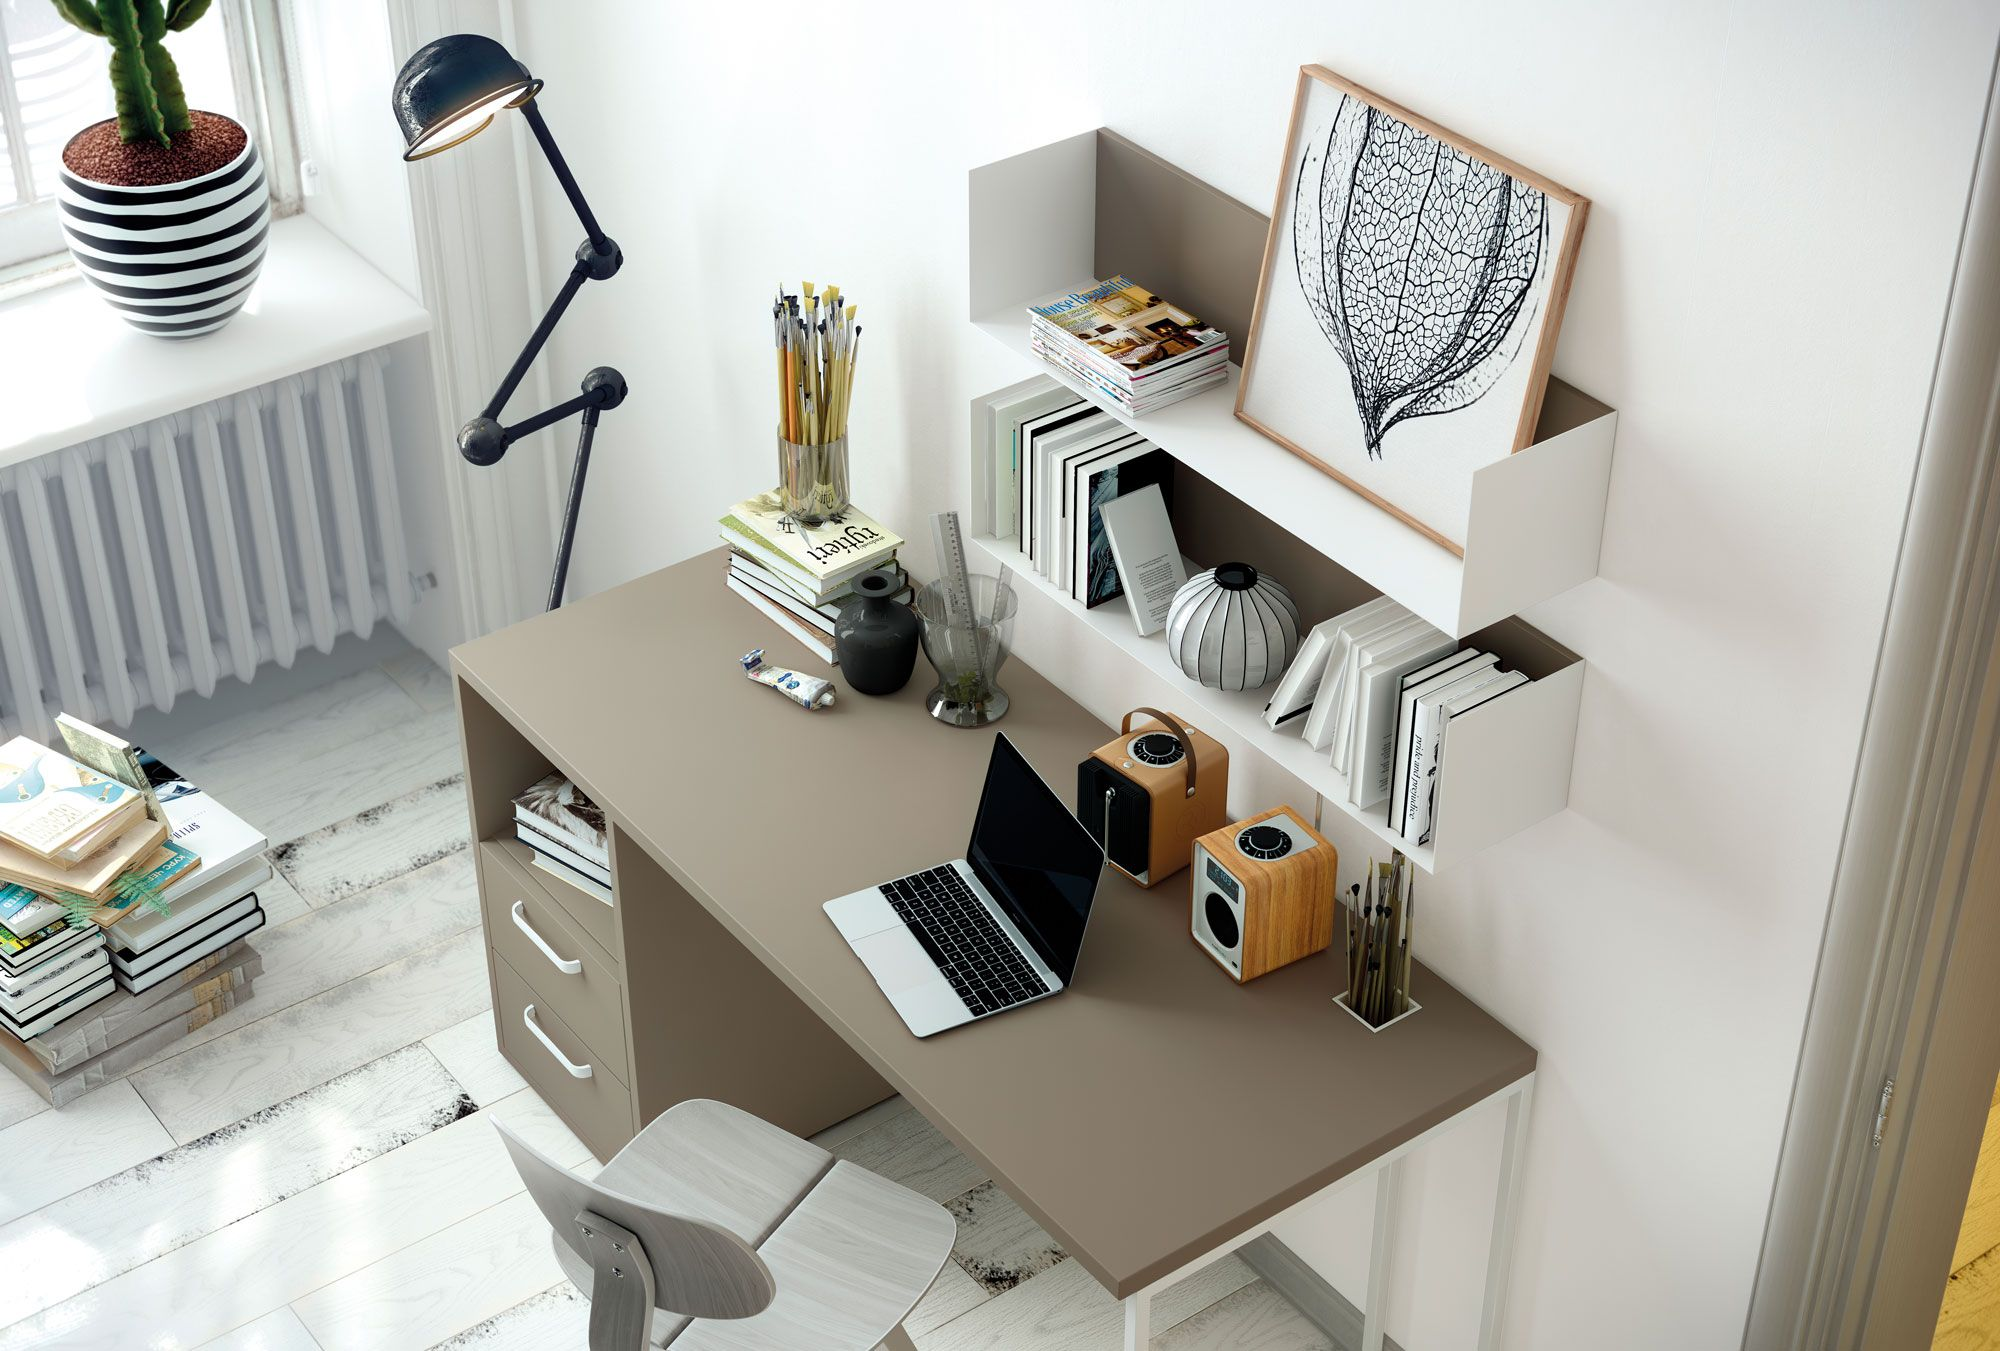 Muebles Lacados Gaete - Habitaci N Juvenil Con Mesa De Estudio Detalle De Estantes [mjhdah]https://i.pinimg.com/736x/59/ef/63/59ef636025301acd7e5f3d7a792f0149.jpg